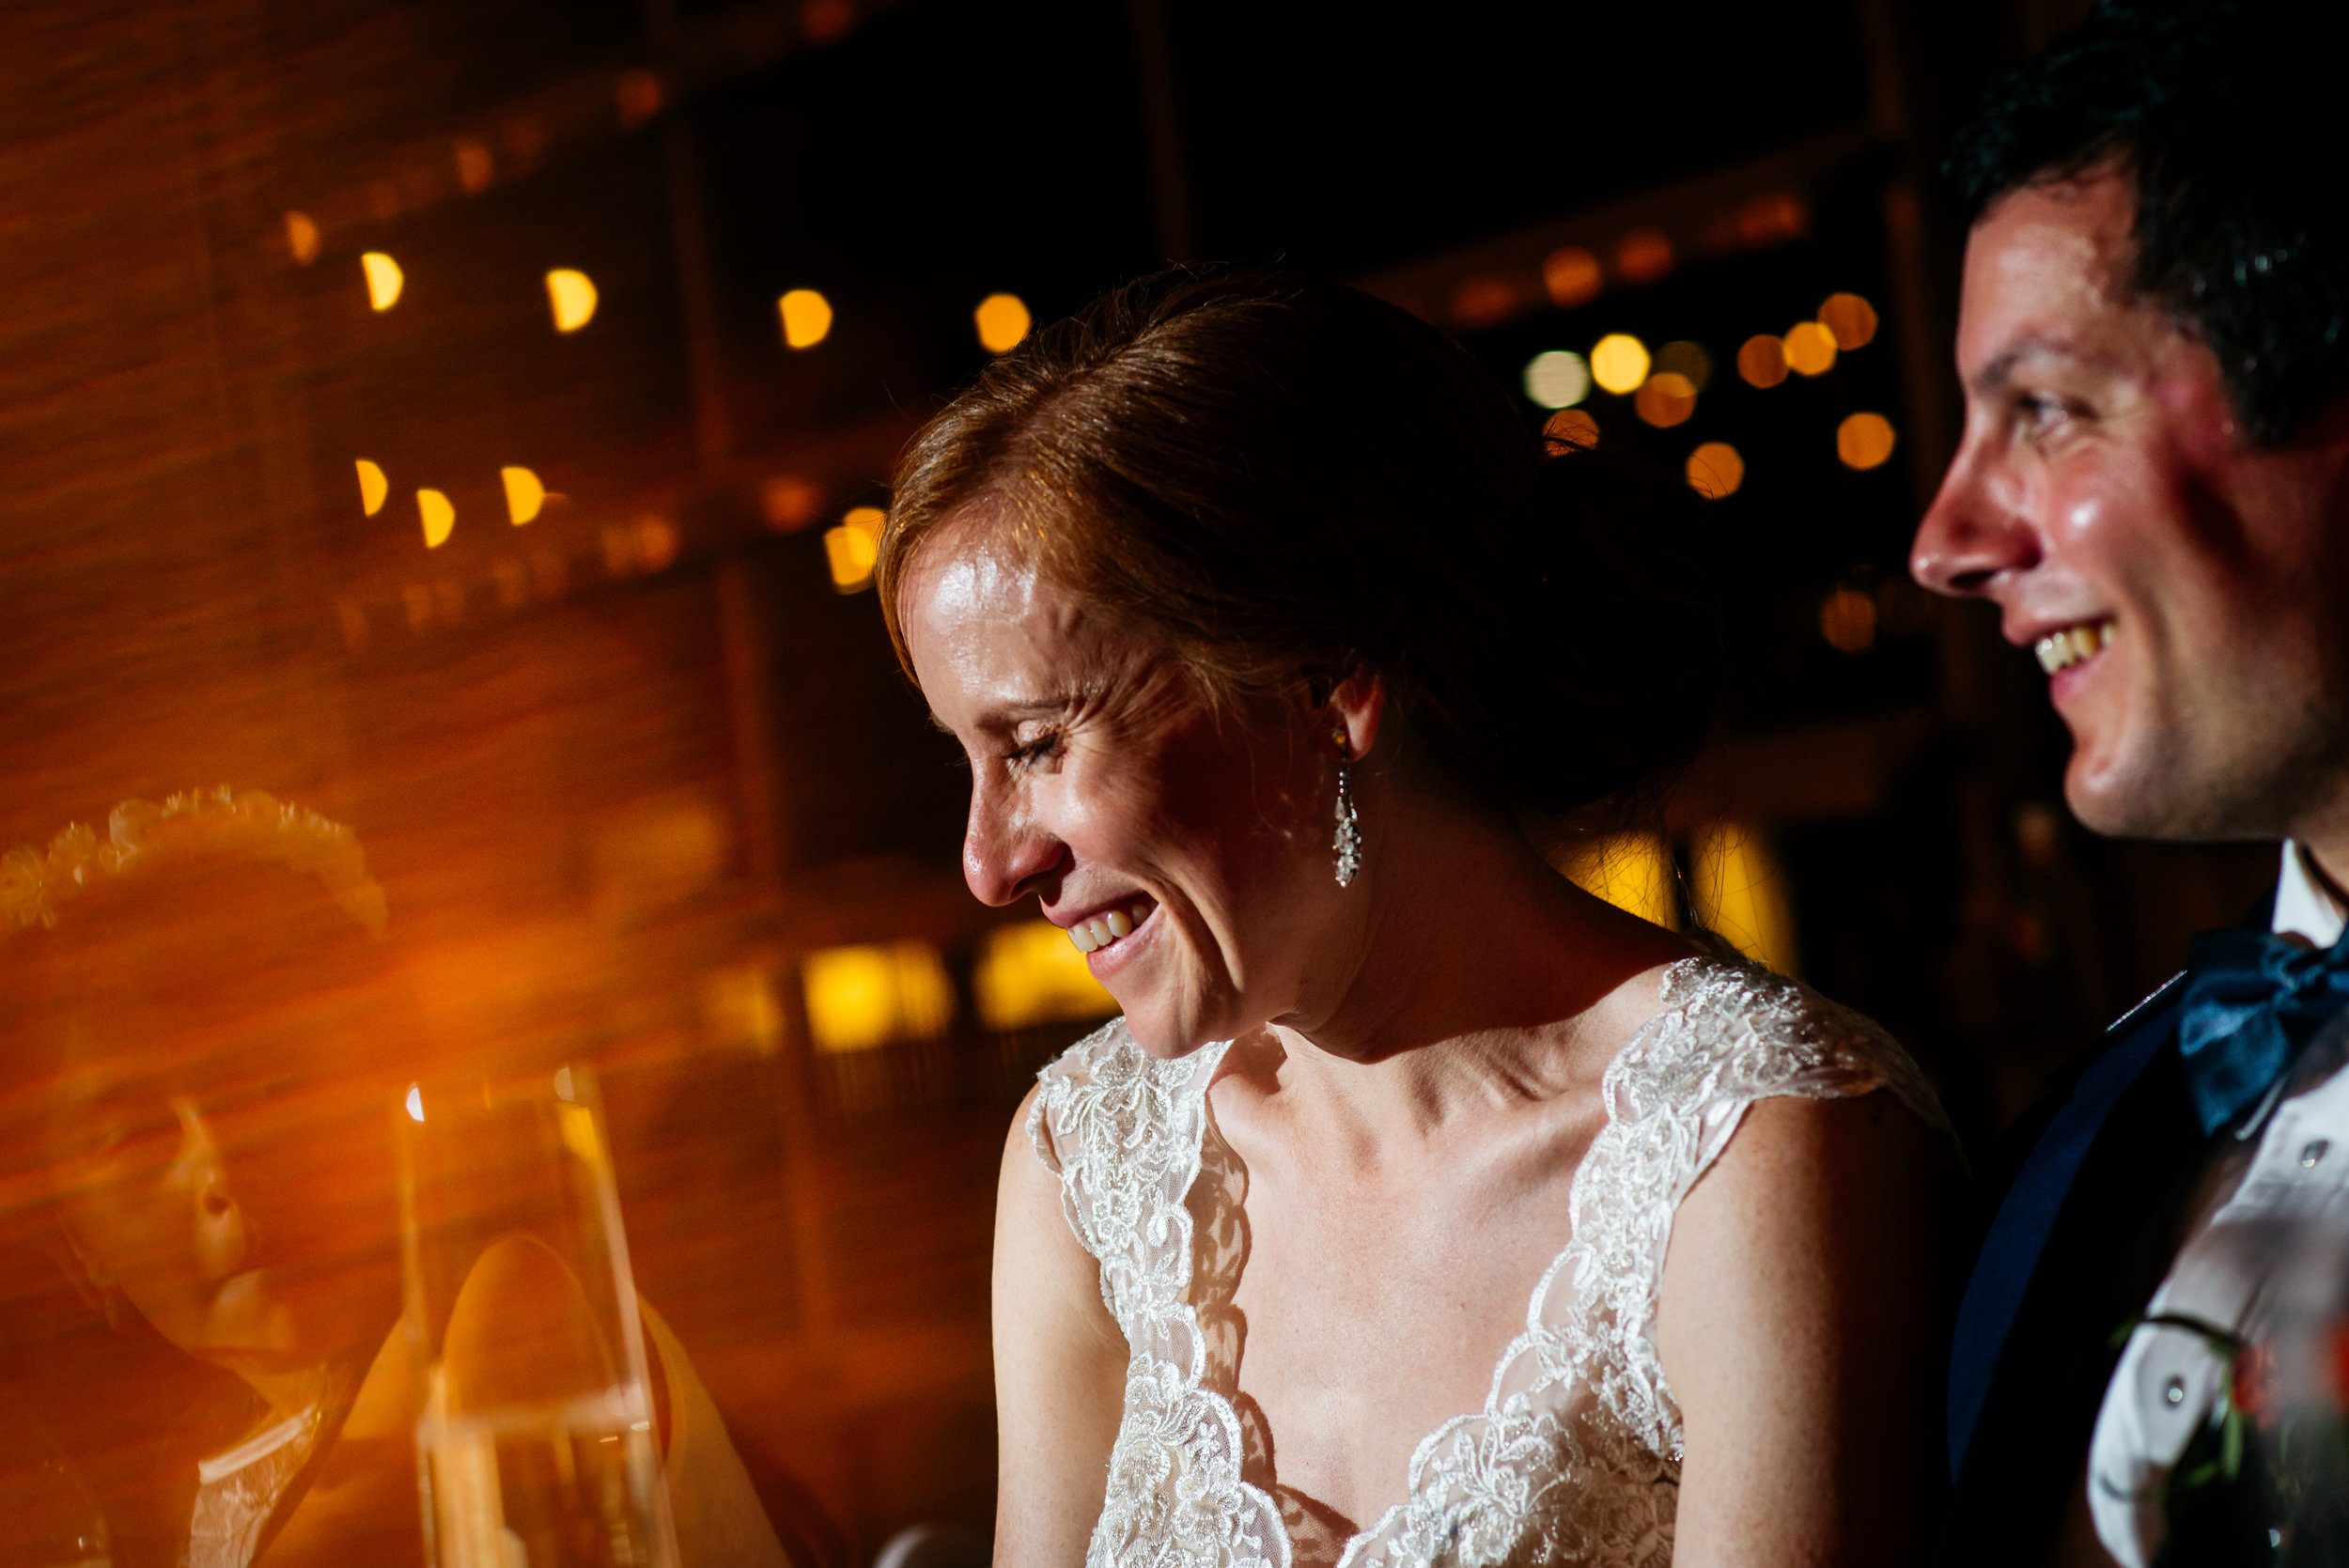 Santa Fe Railyards Wedding Extended Play Photography-15.jpg